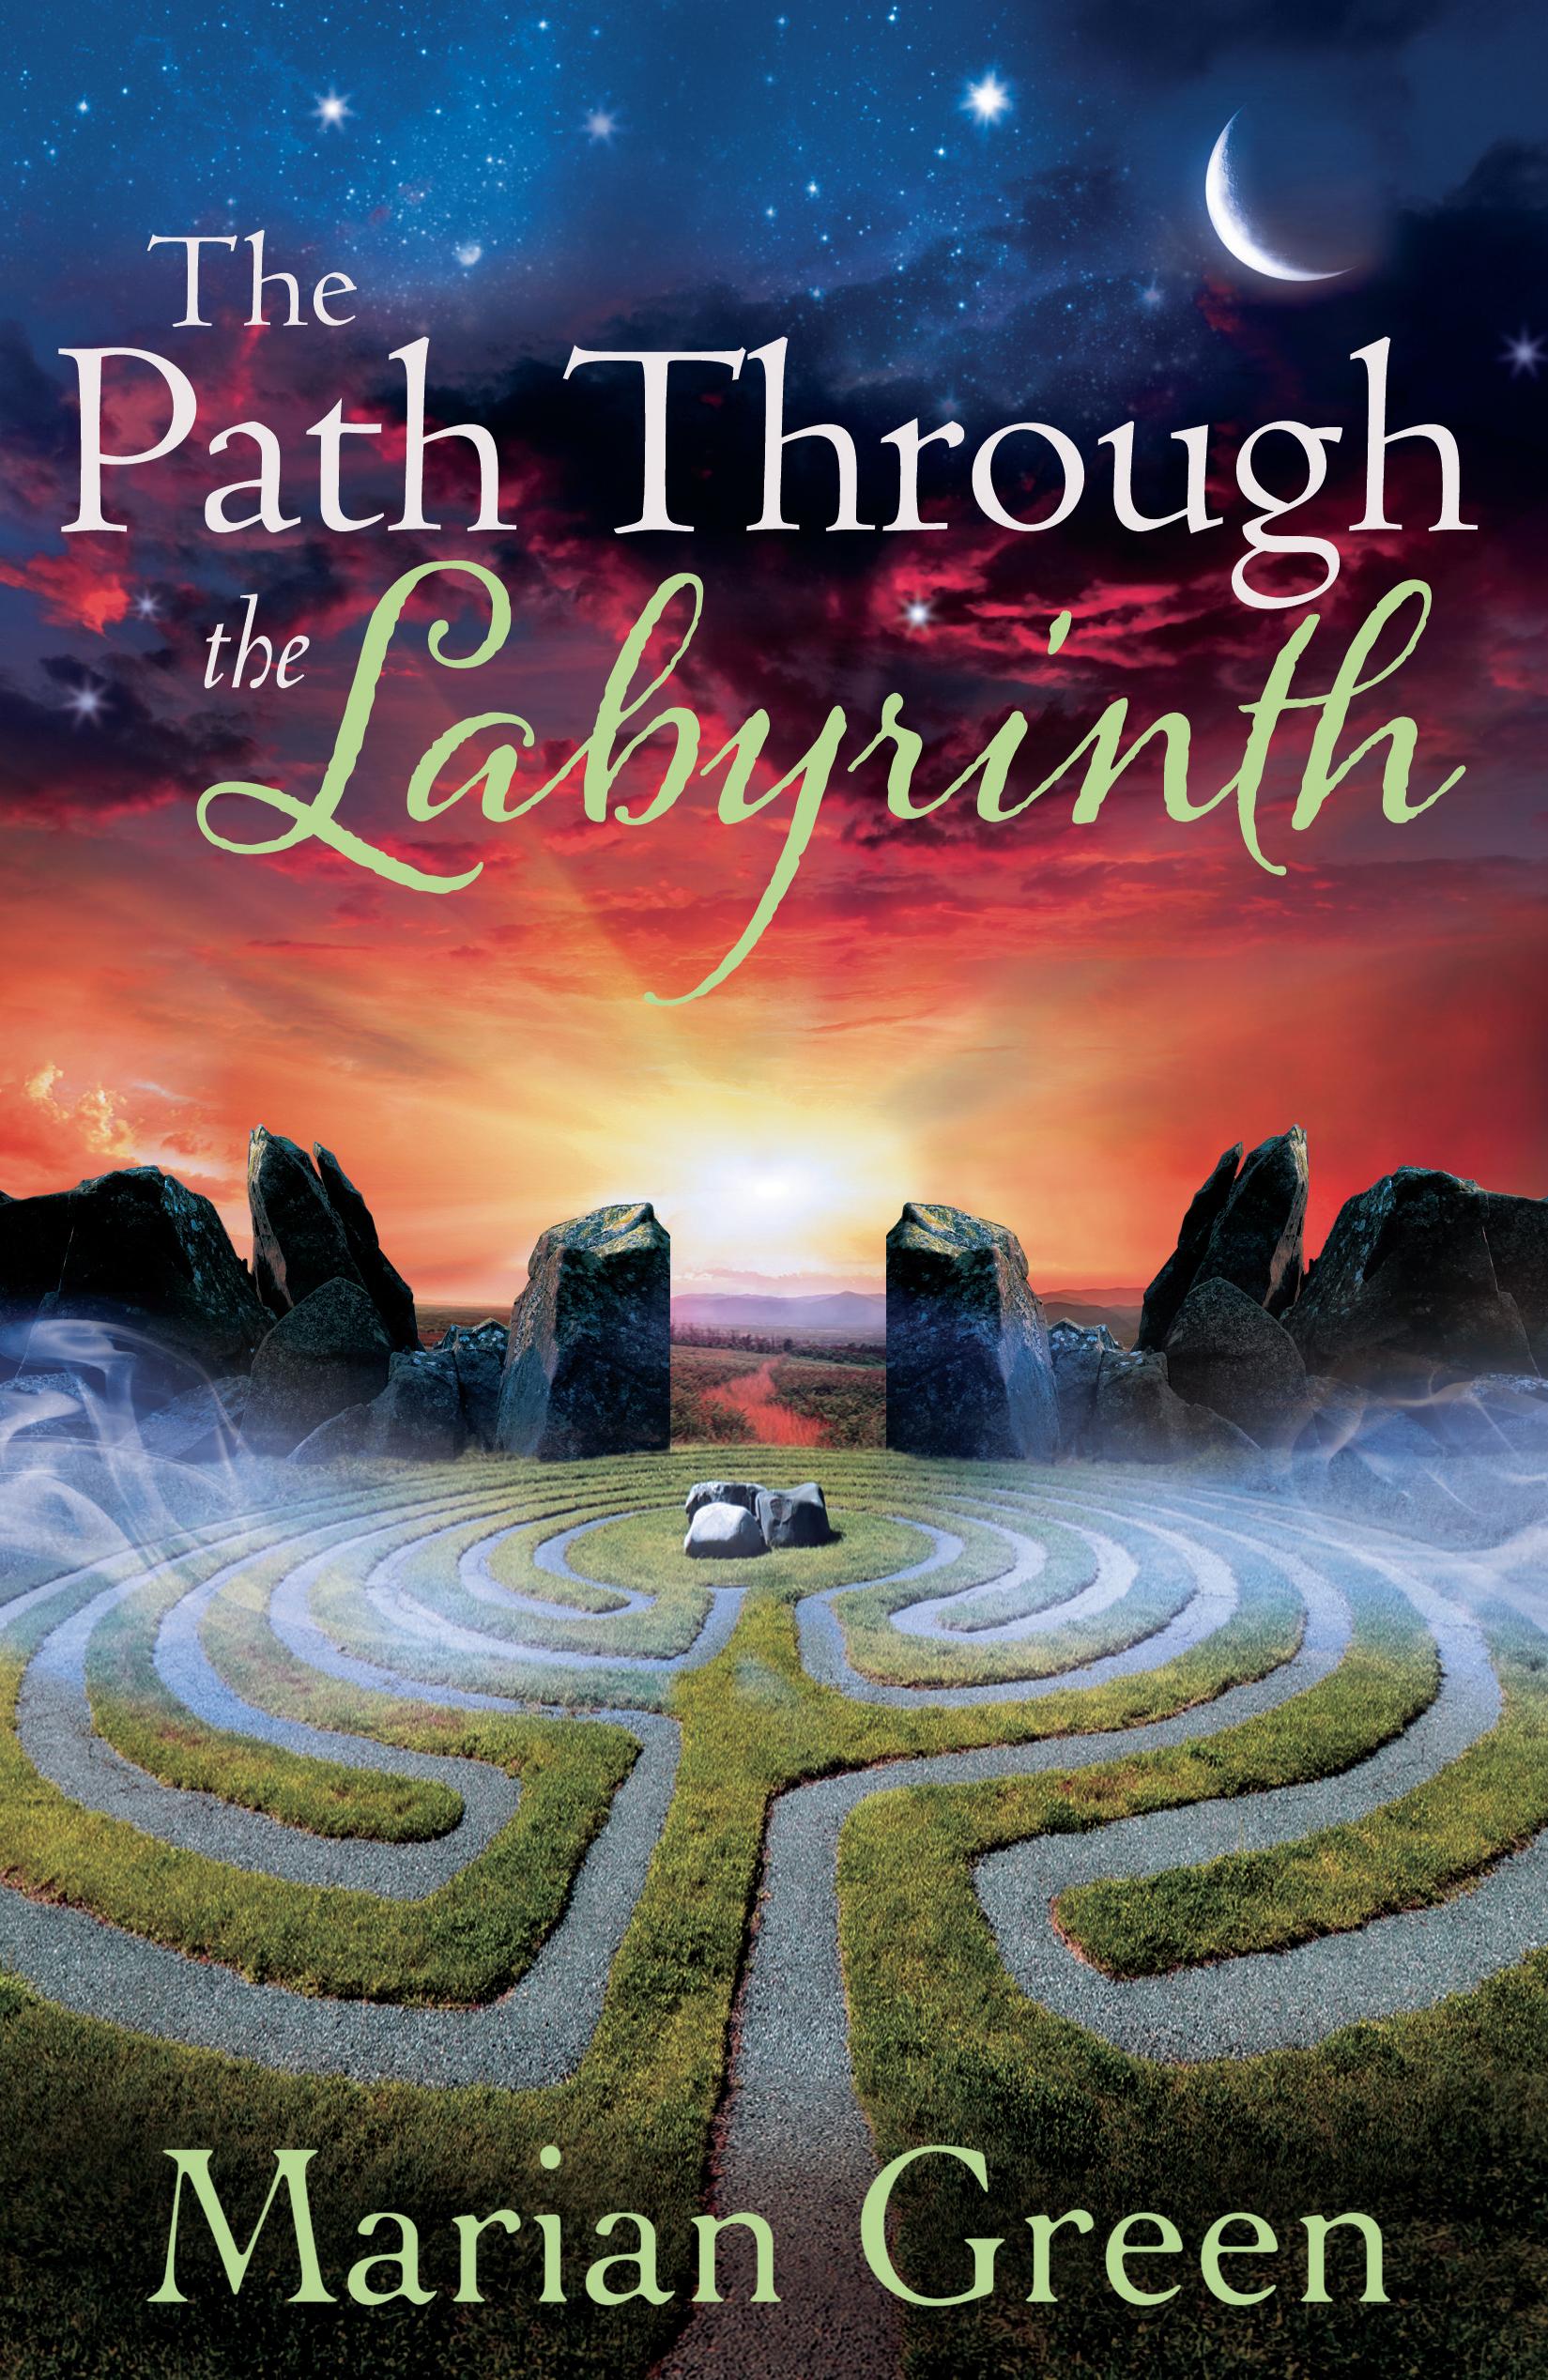 The Path Through the labyrinth